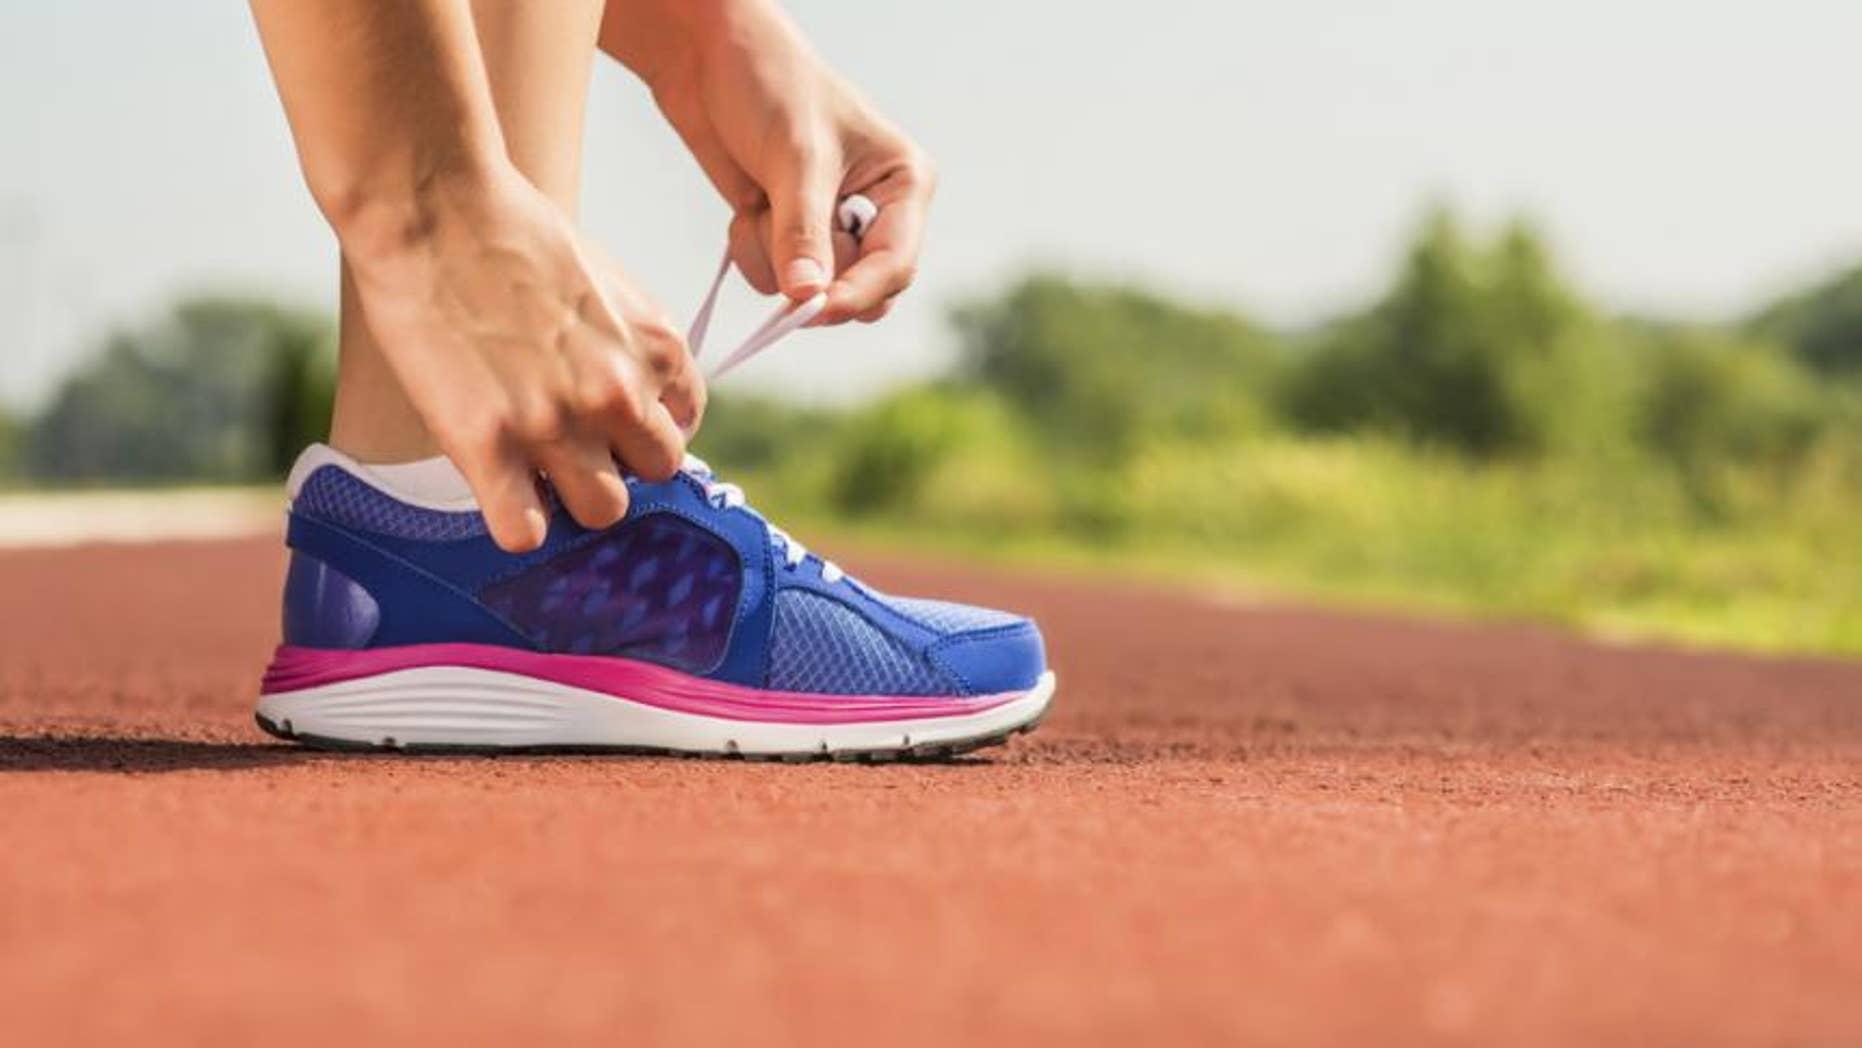 Sex story runner jogger authoritative